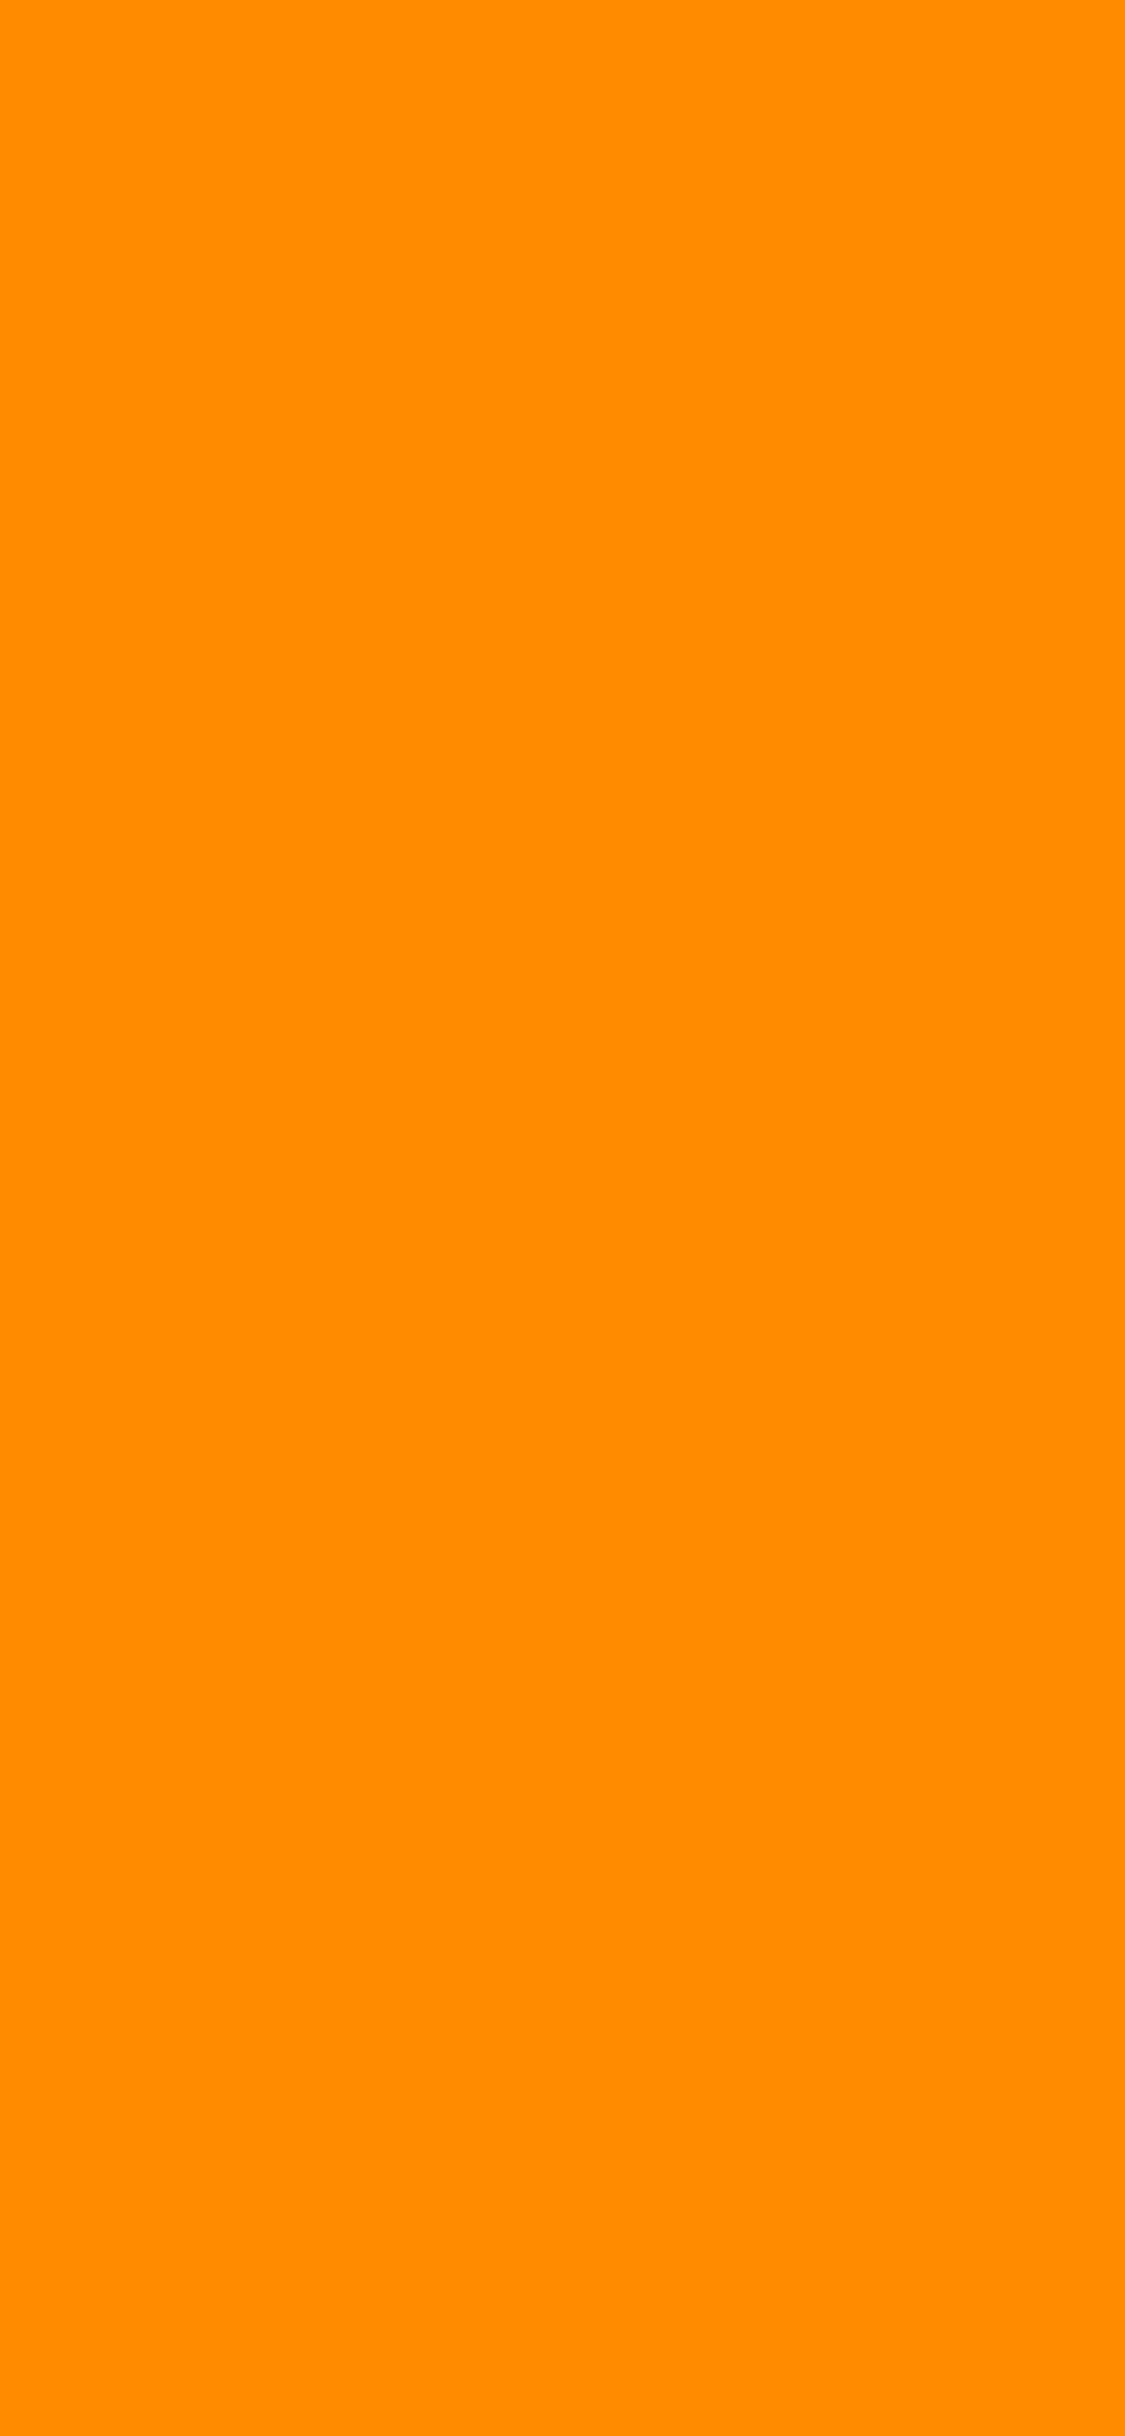 1125x2436 Dark Orange Solid Color Background